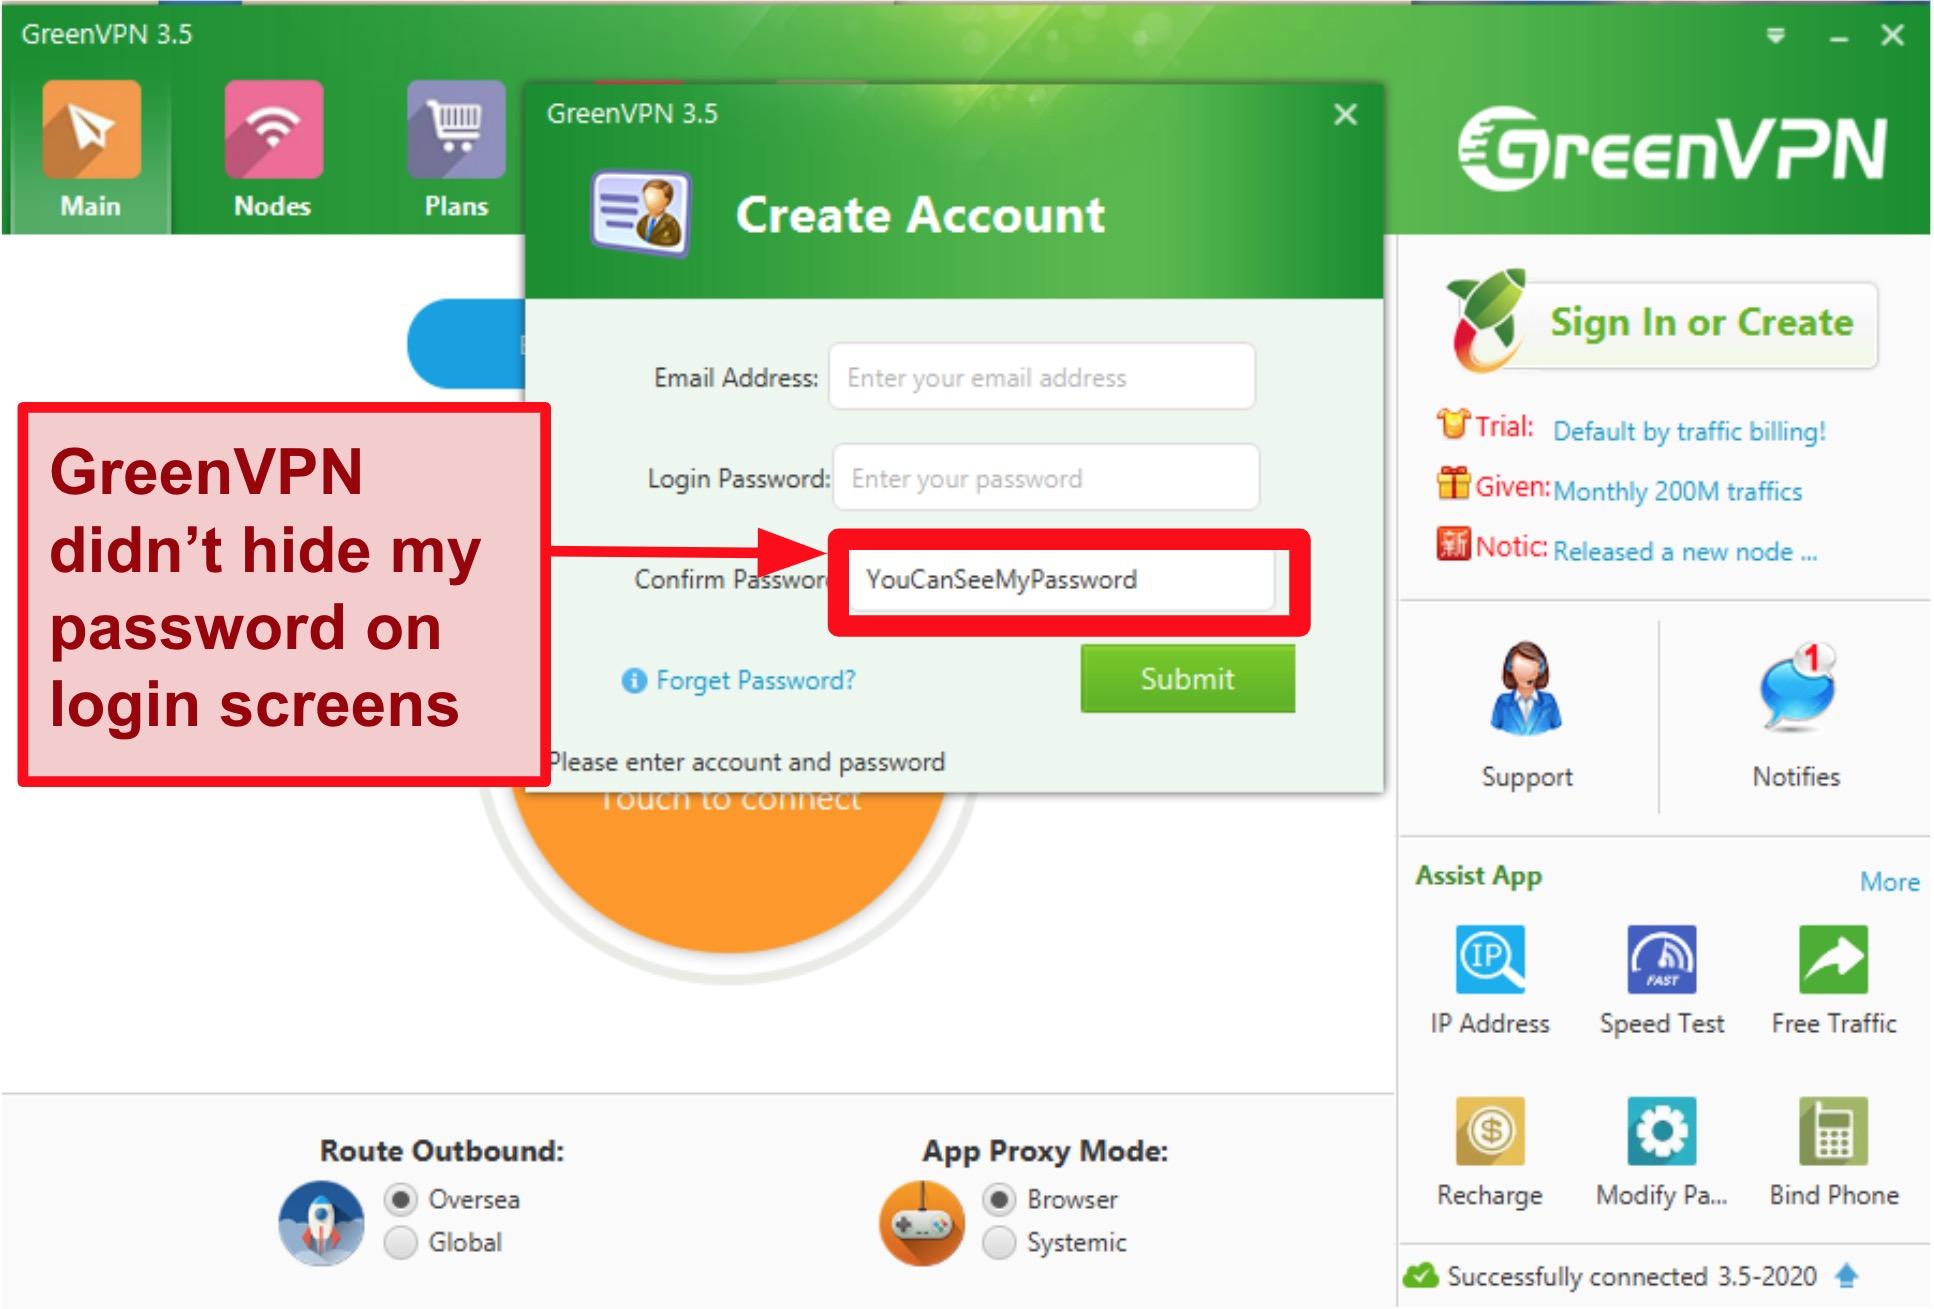 Screenshot of GreenVPN interface showing account creation and login screen.